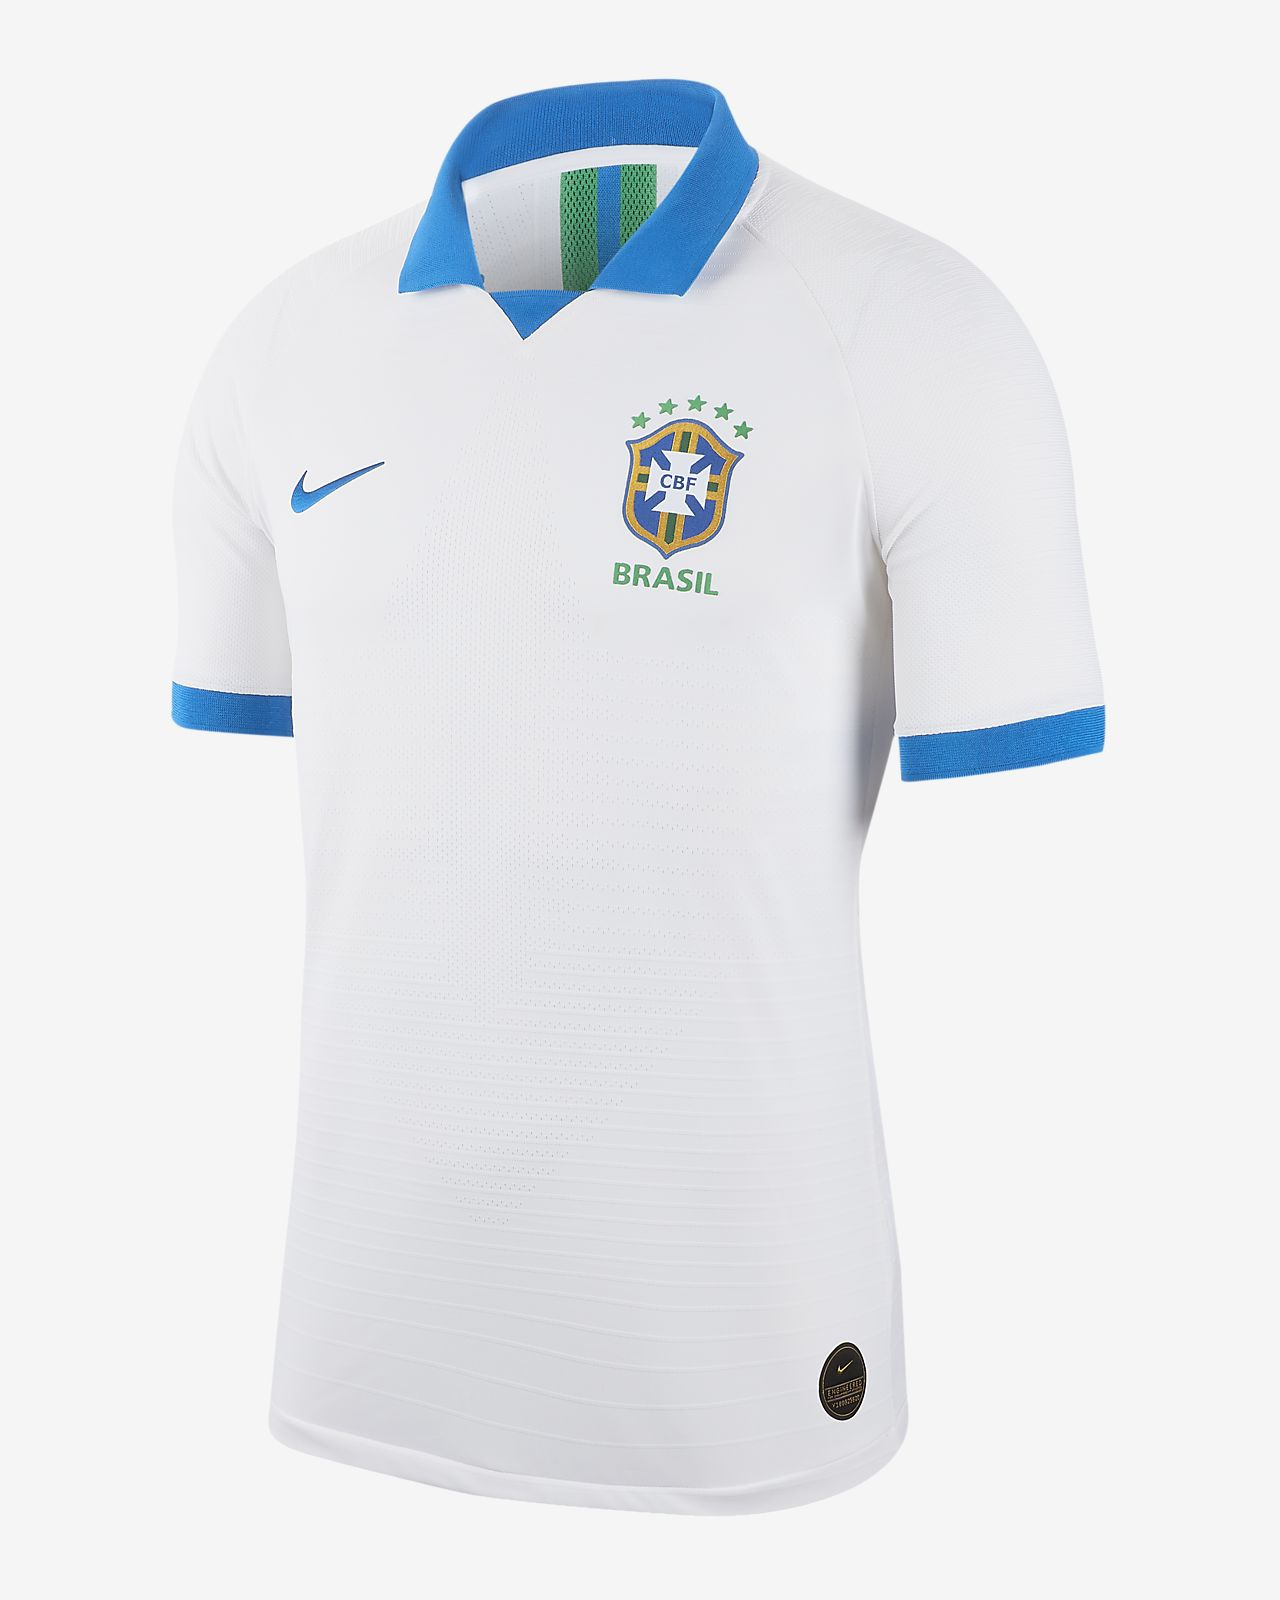 Maillot Away Brasil Vapor Match 2019 pour Homme